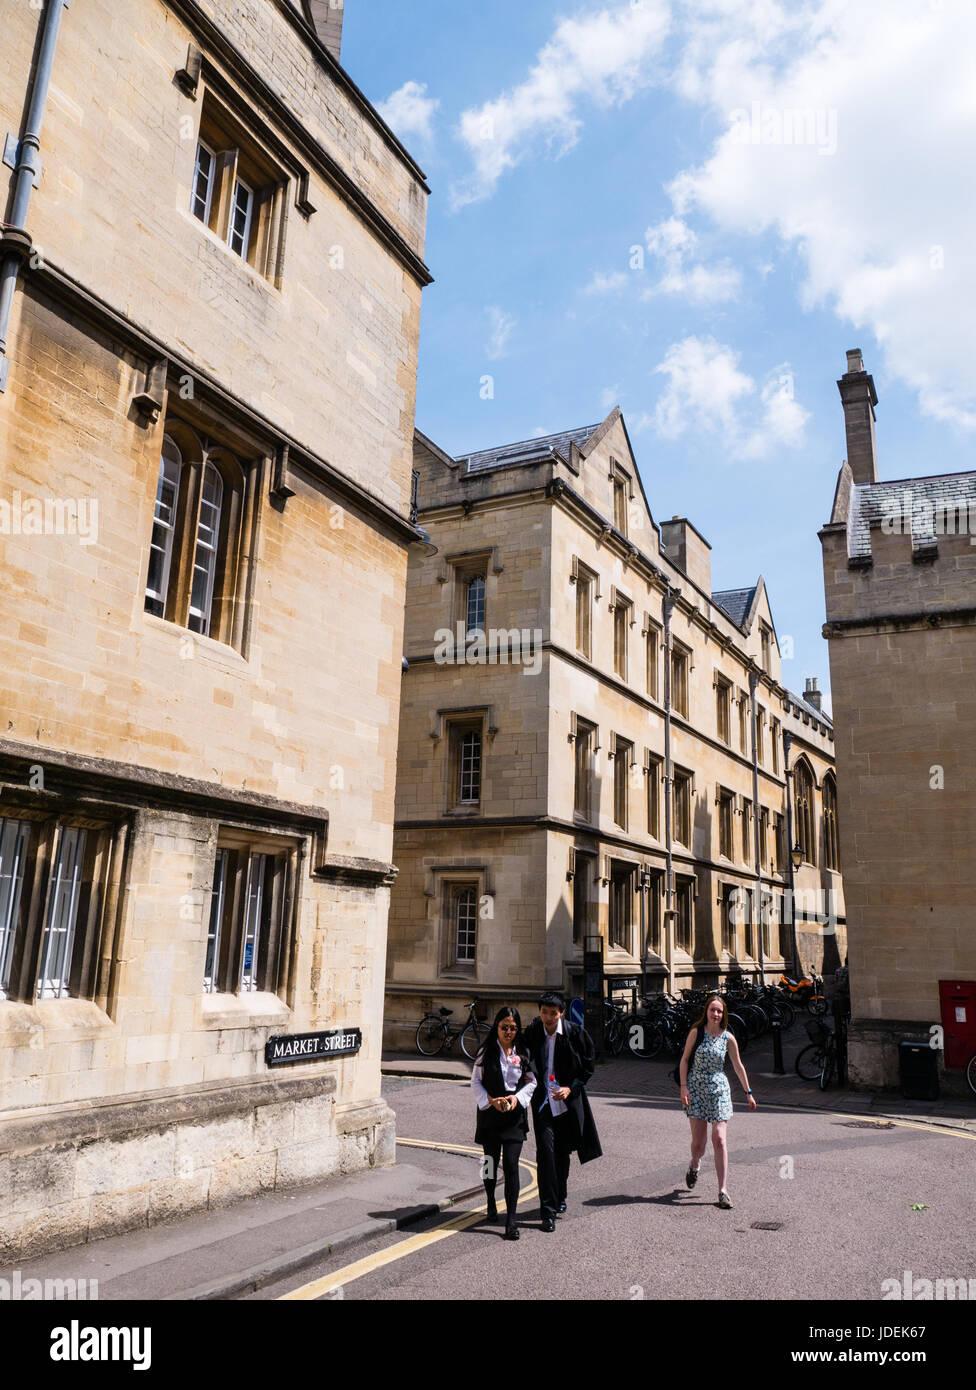 Market Street, Oxford, Oxfordshire, England - Stock Image